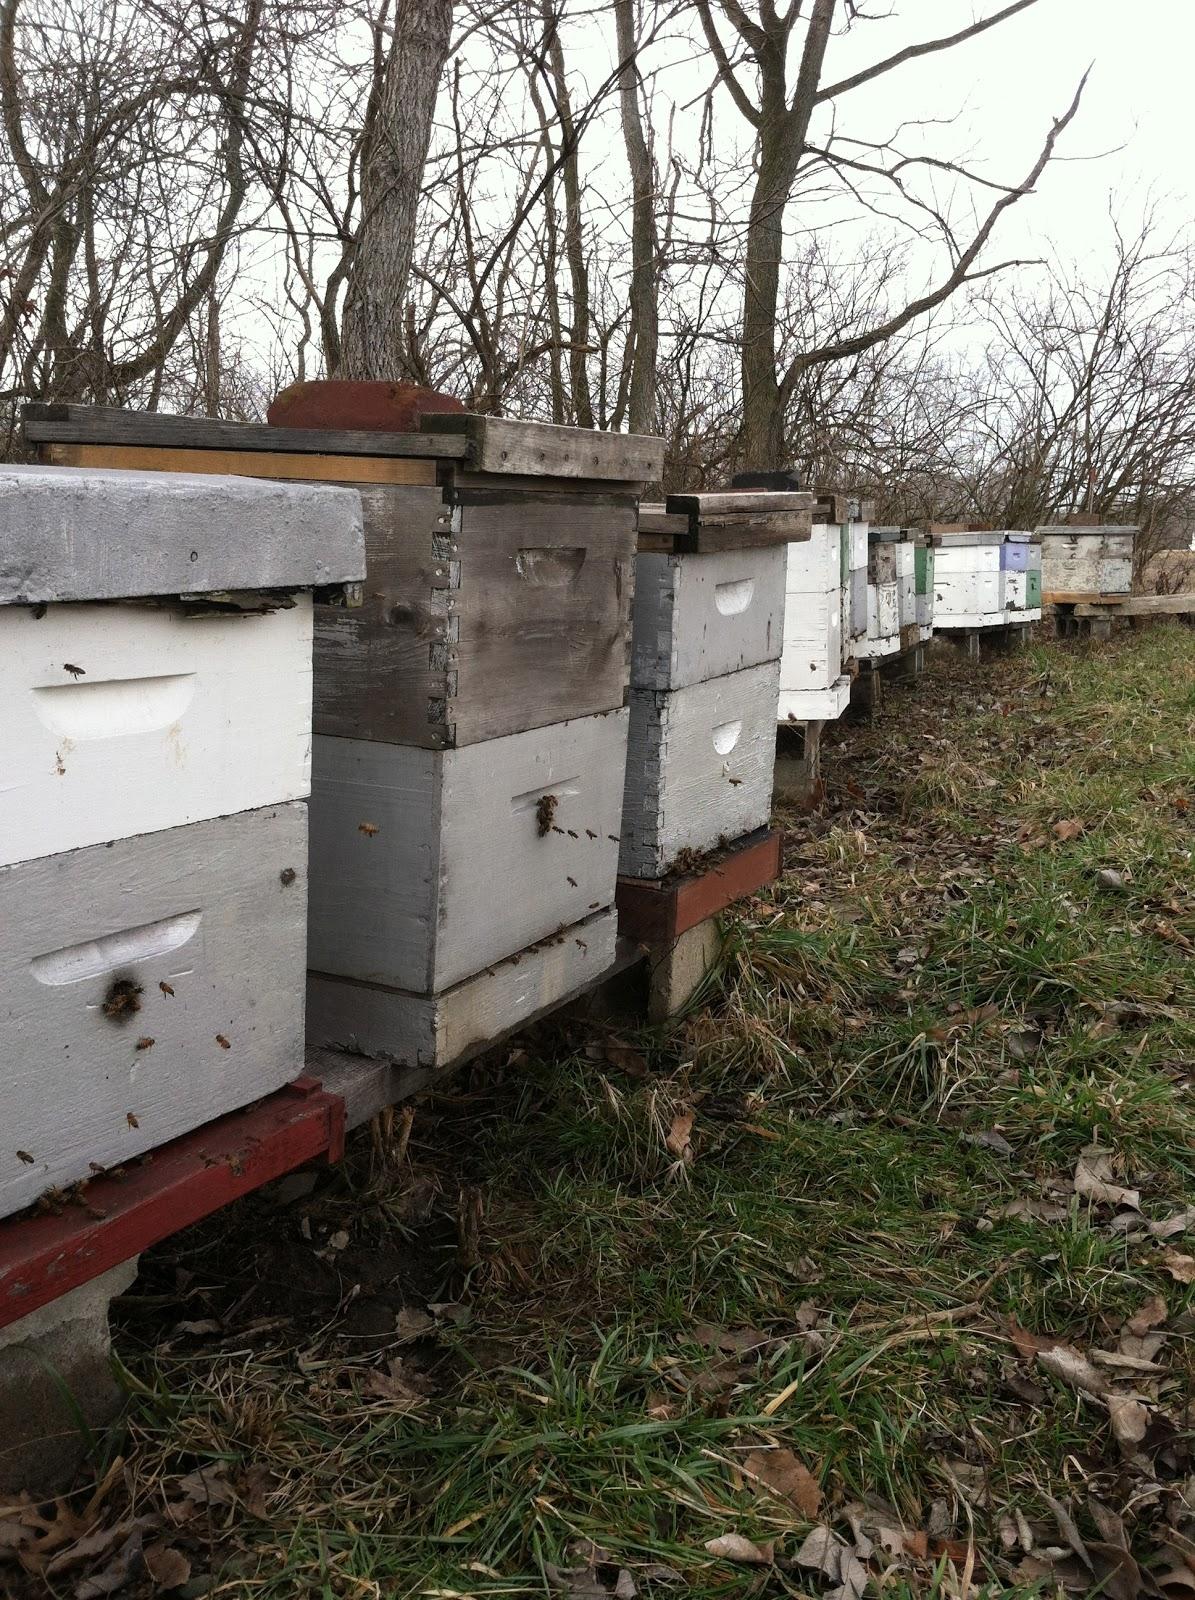 Honeyrun Farm: What Do Bees Do All Winter?